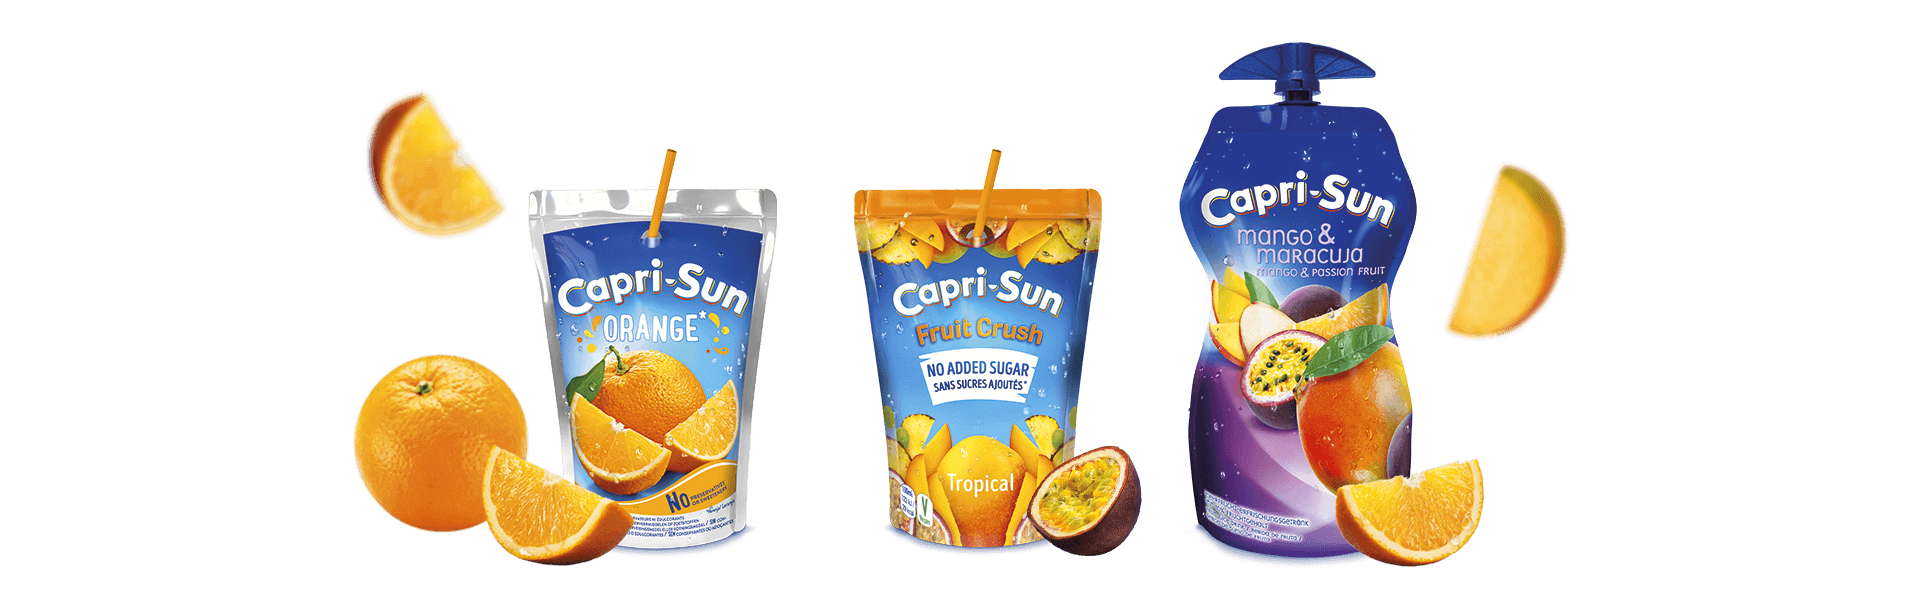 Capri Sun Orange 200ml Fruit Crush No added sugar Tropical 200ml and Mango Maracuja 330ml with flying fruits